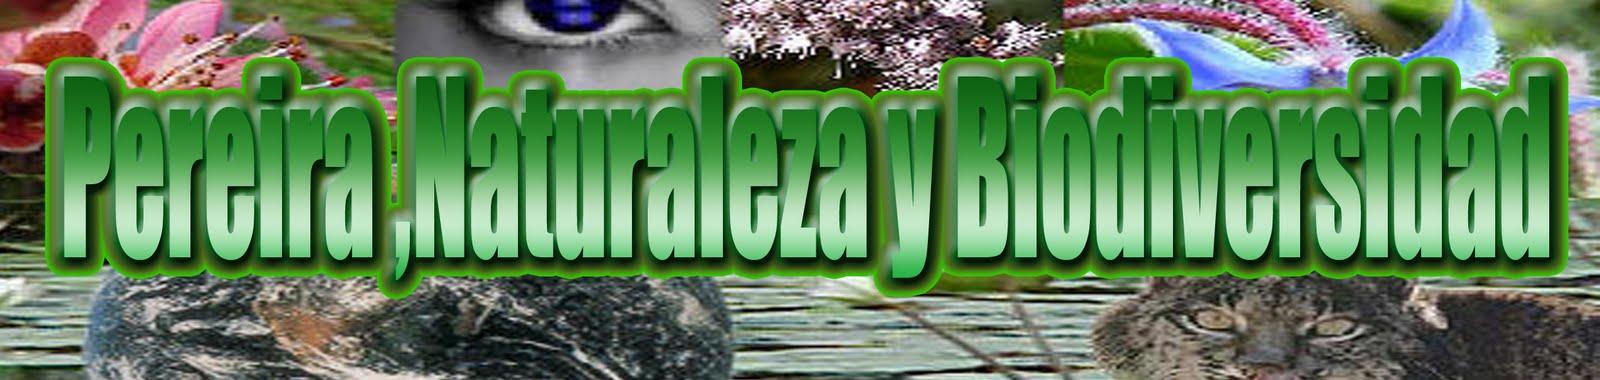 Pereira,naturaleza y biodiversidad